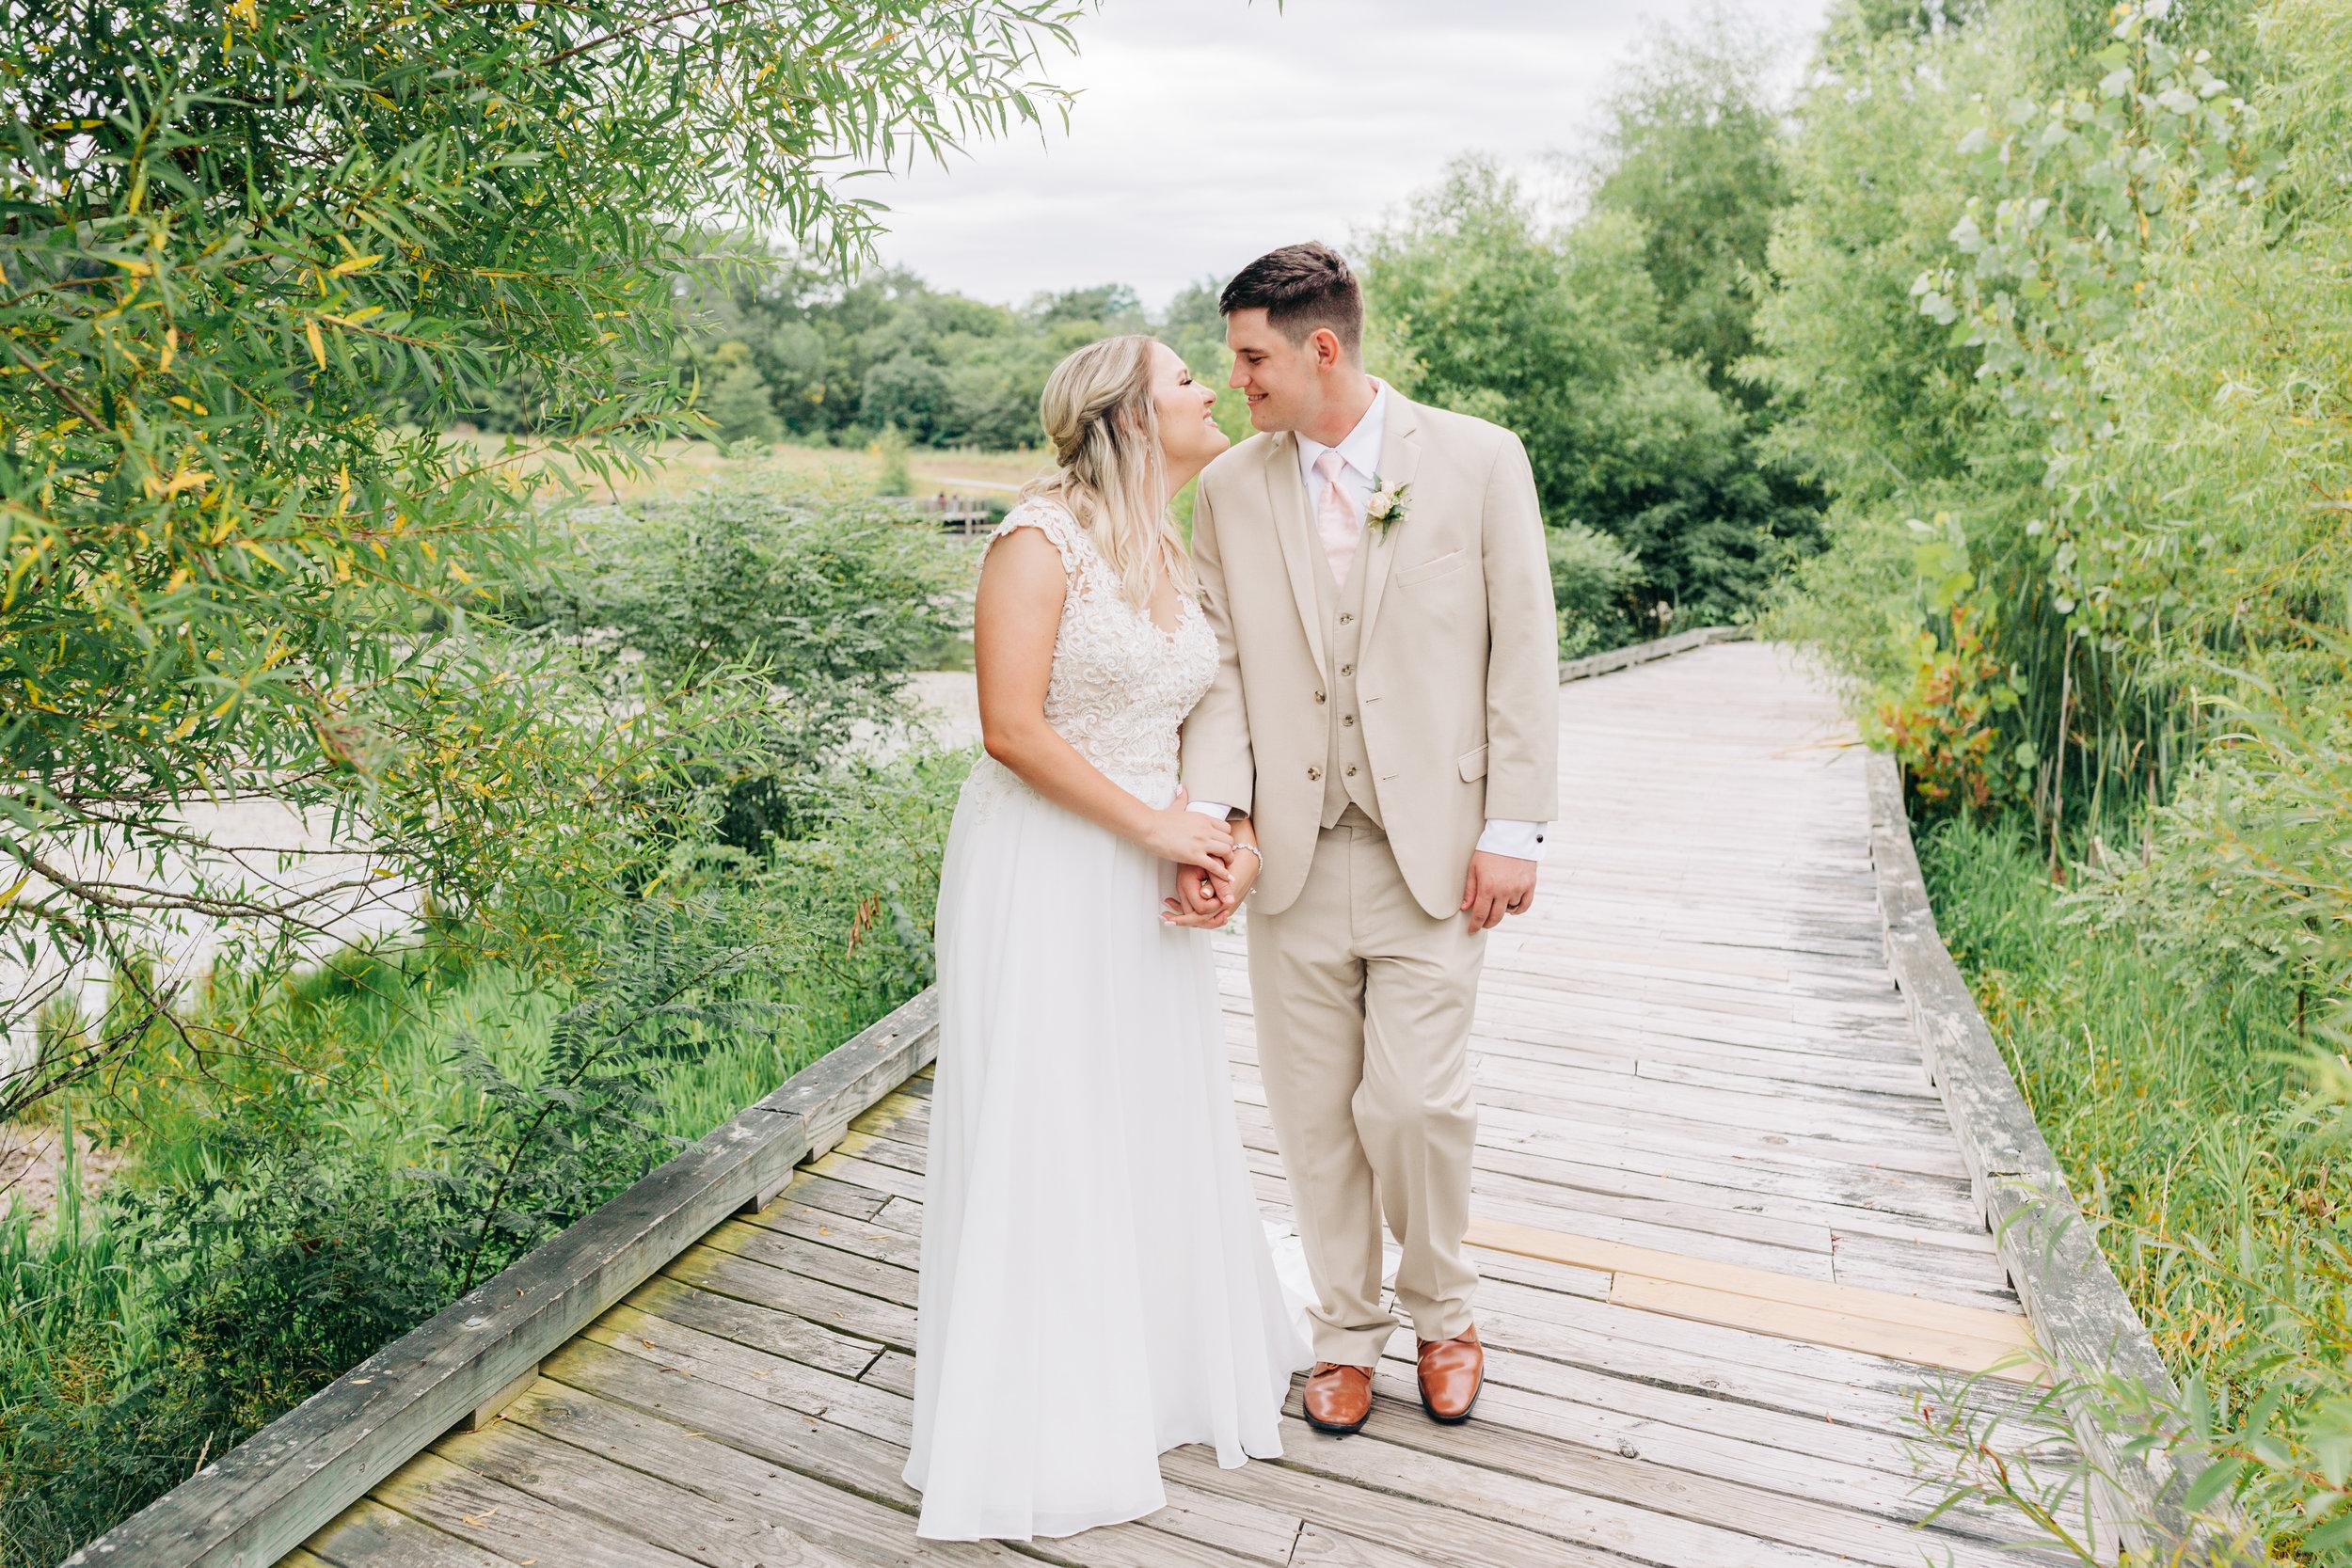 Dorothy_Louise_Photography_Marissa_Jake_Wentzville_MO_Wedding-35.jpg